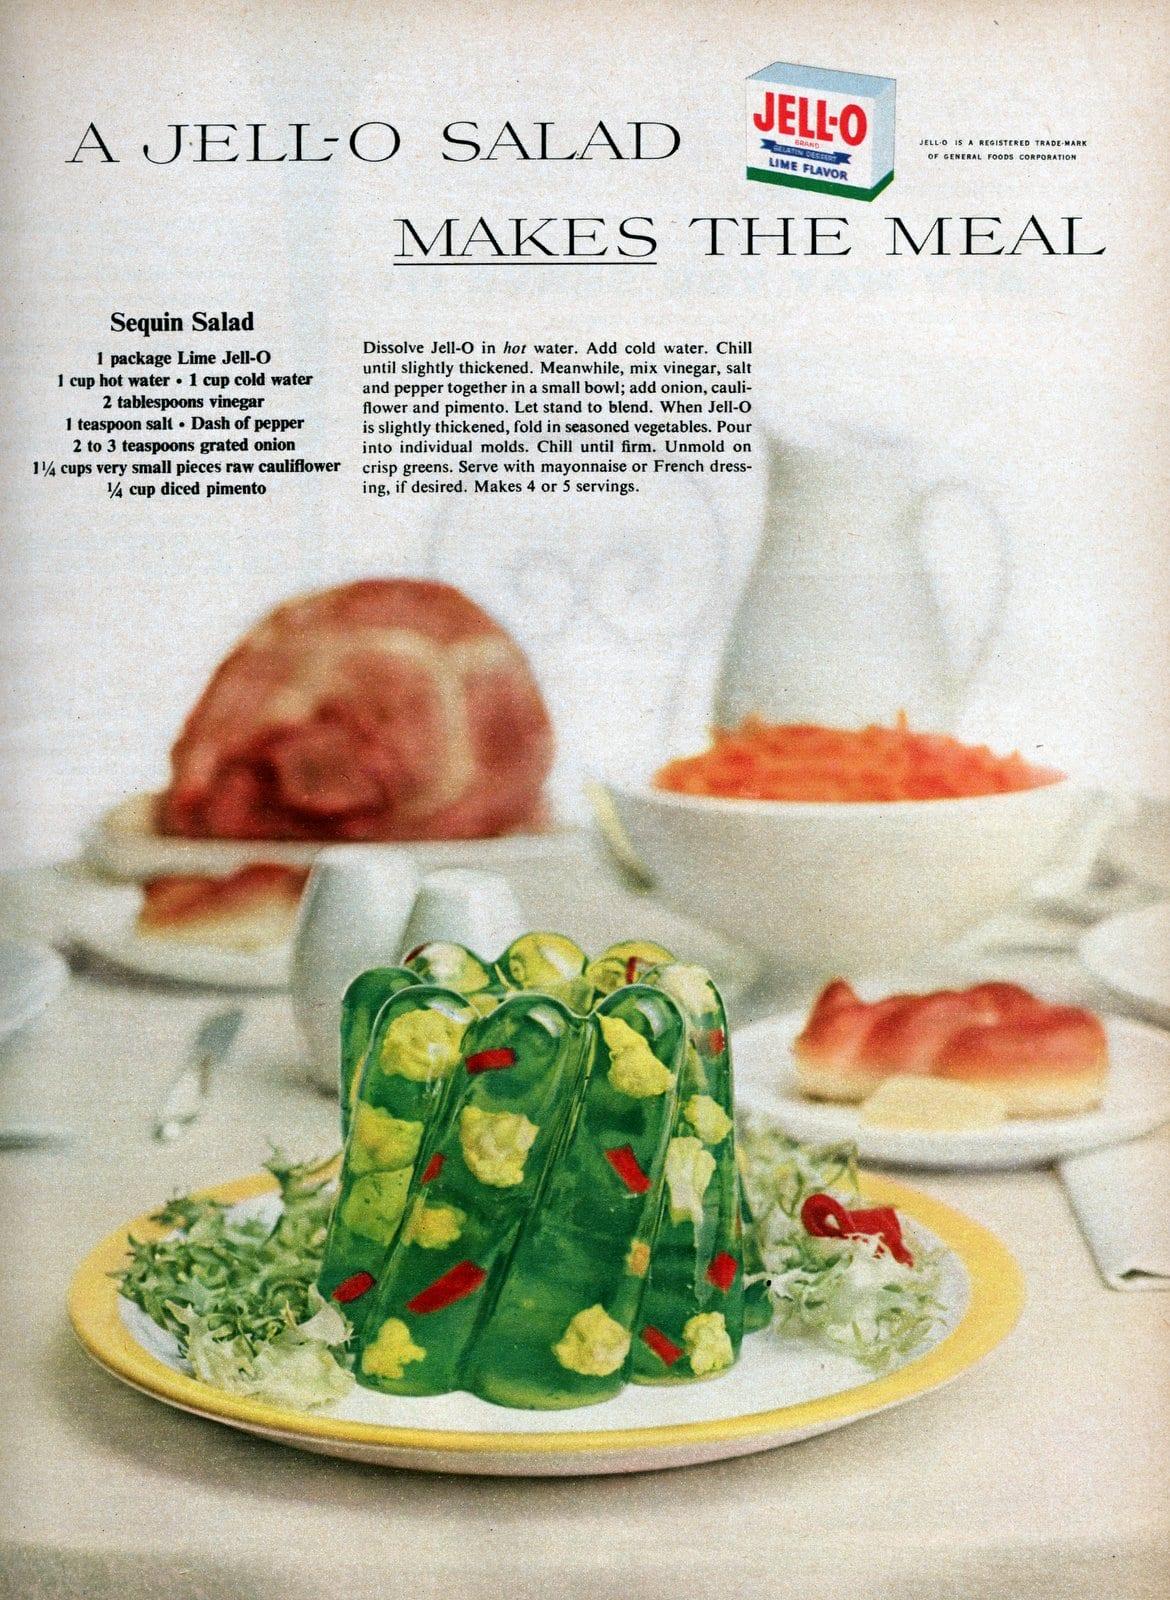 Retro sequin salad Jell-O mold had cauliflower & onion in lime gelatin